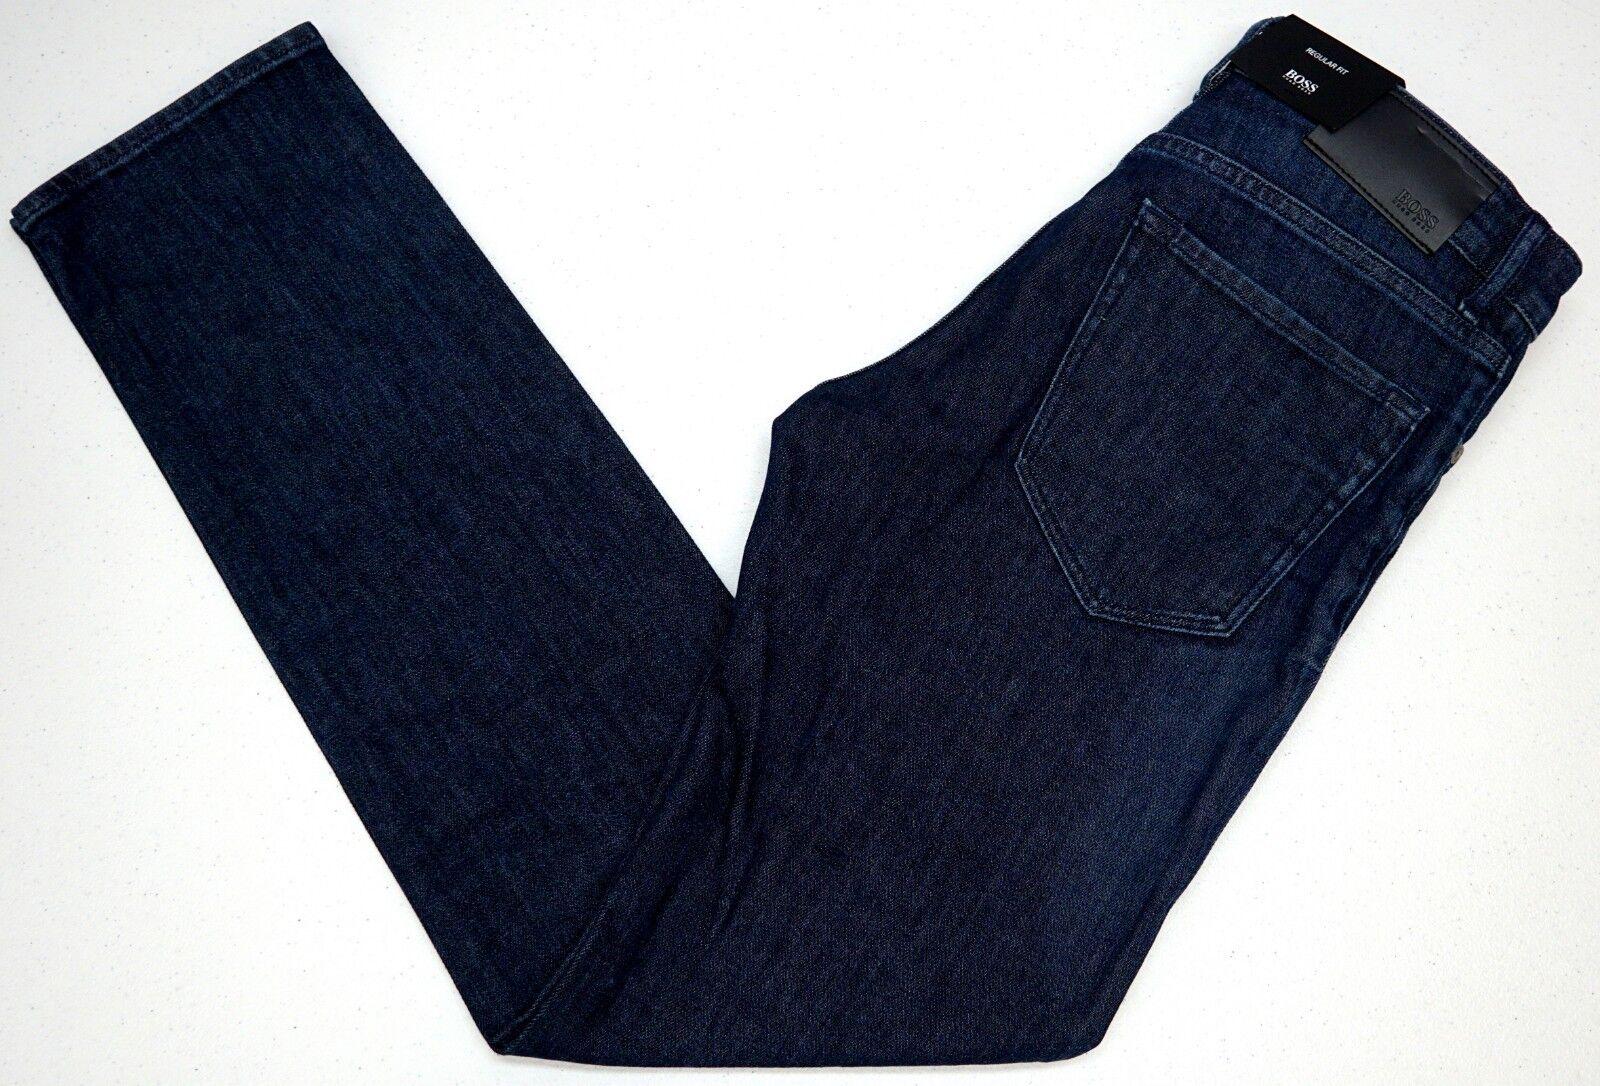 NWT  HUGO BOSS Dark bluee JEANS Regular Fit Mens Size 30 32 Maine Stretch NEW